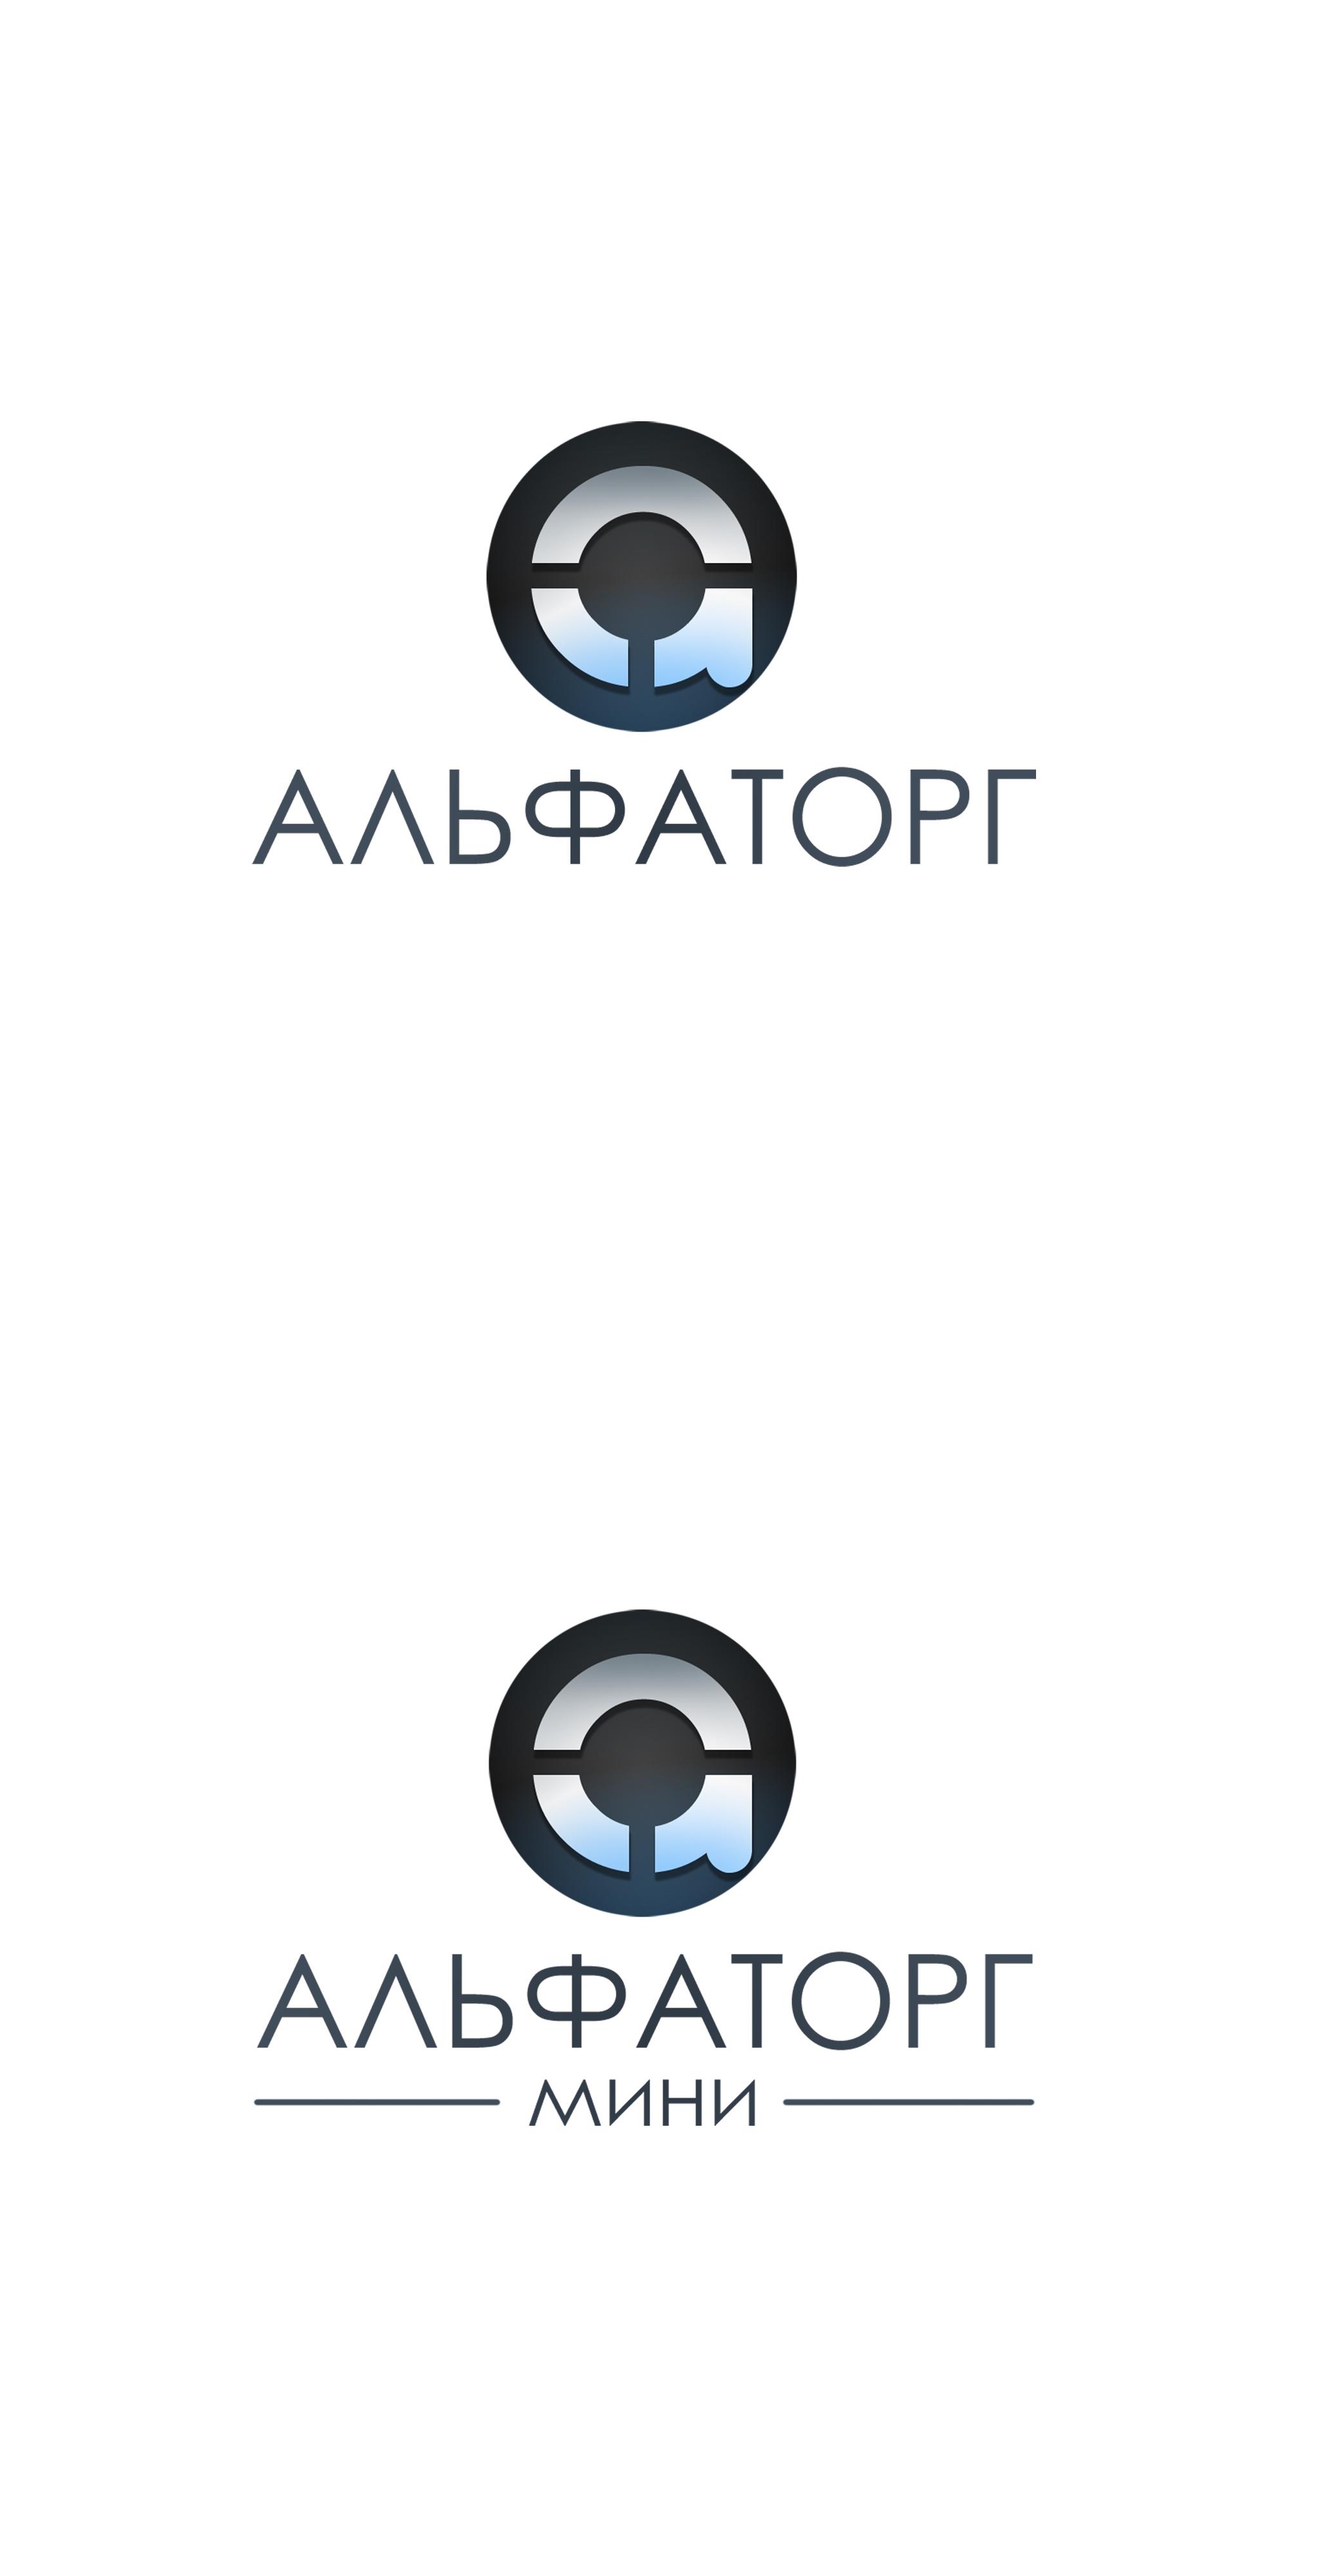 Логотип и фирменный стиль фото f_8435f01c6578386b.jpg